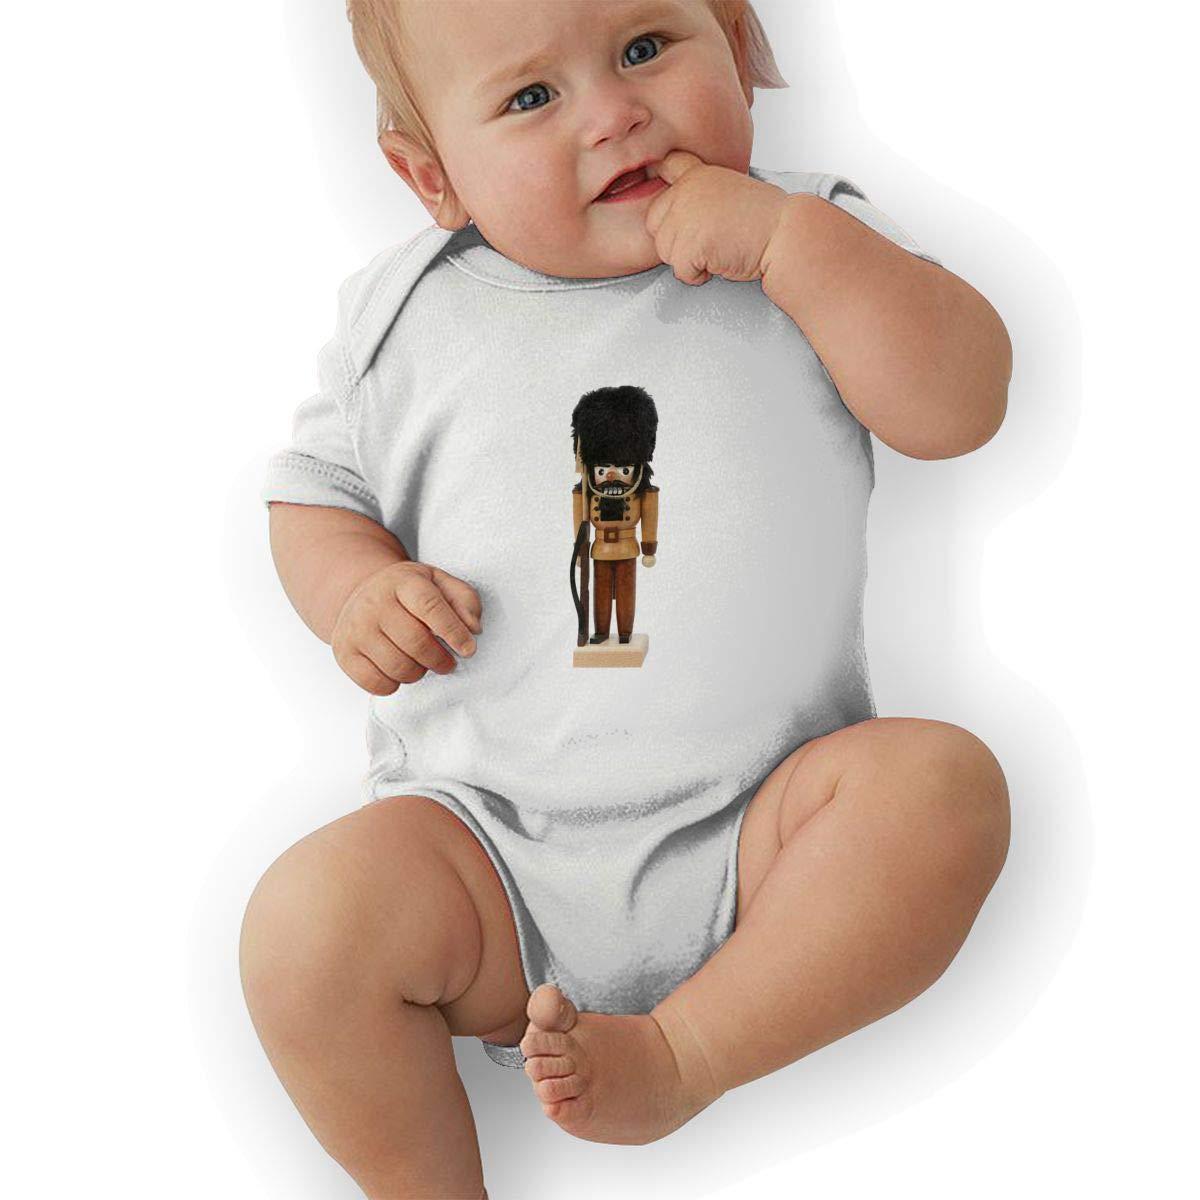 HappyLifea Nutcracker Doll Newborn Baby Short Sleeve Romper Infant Summer Clothing